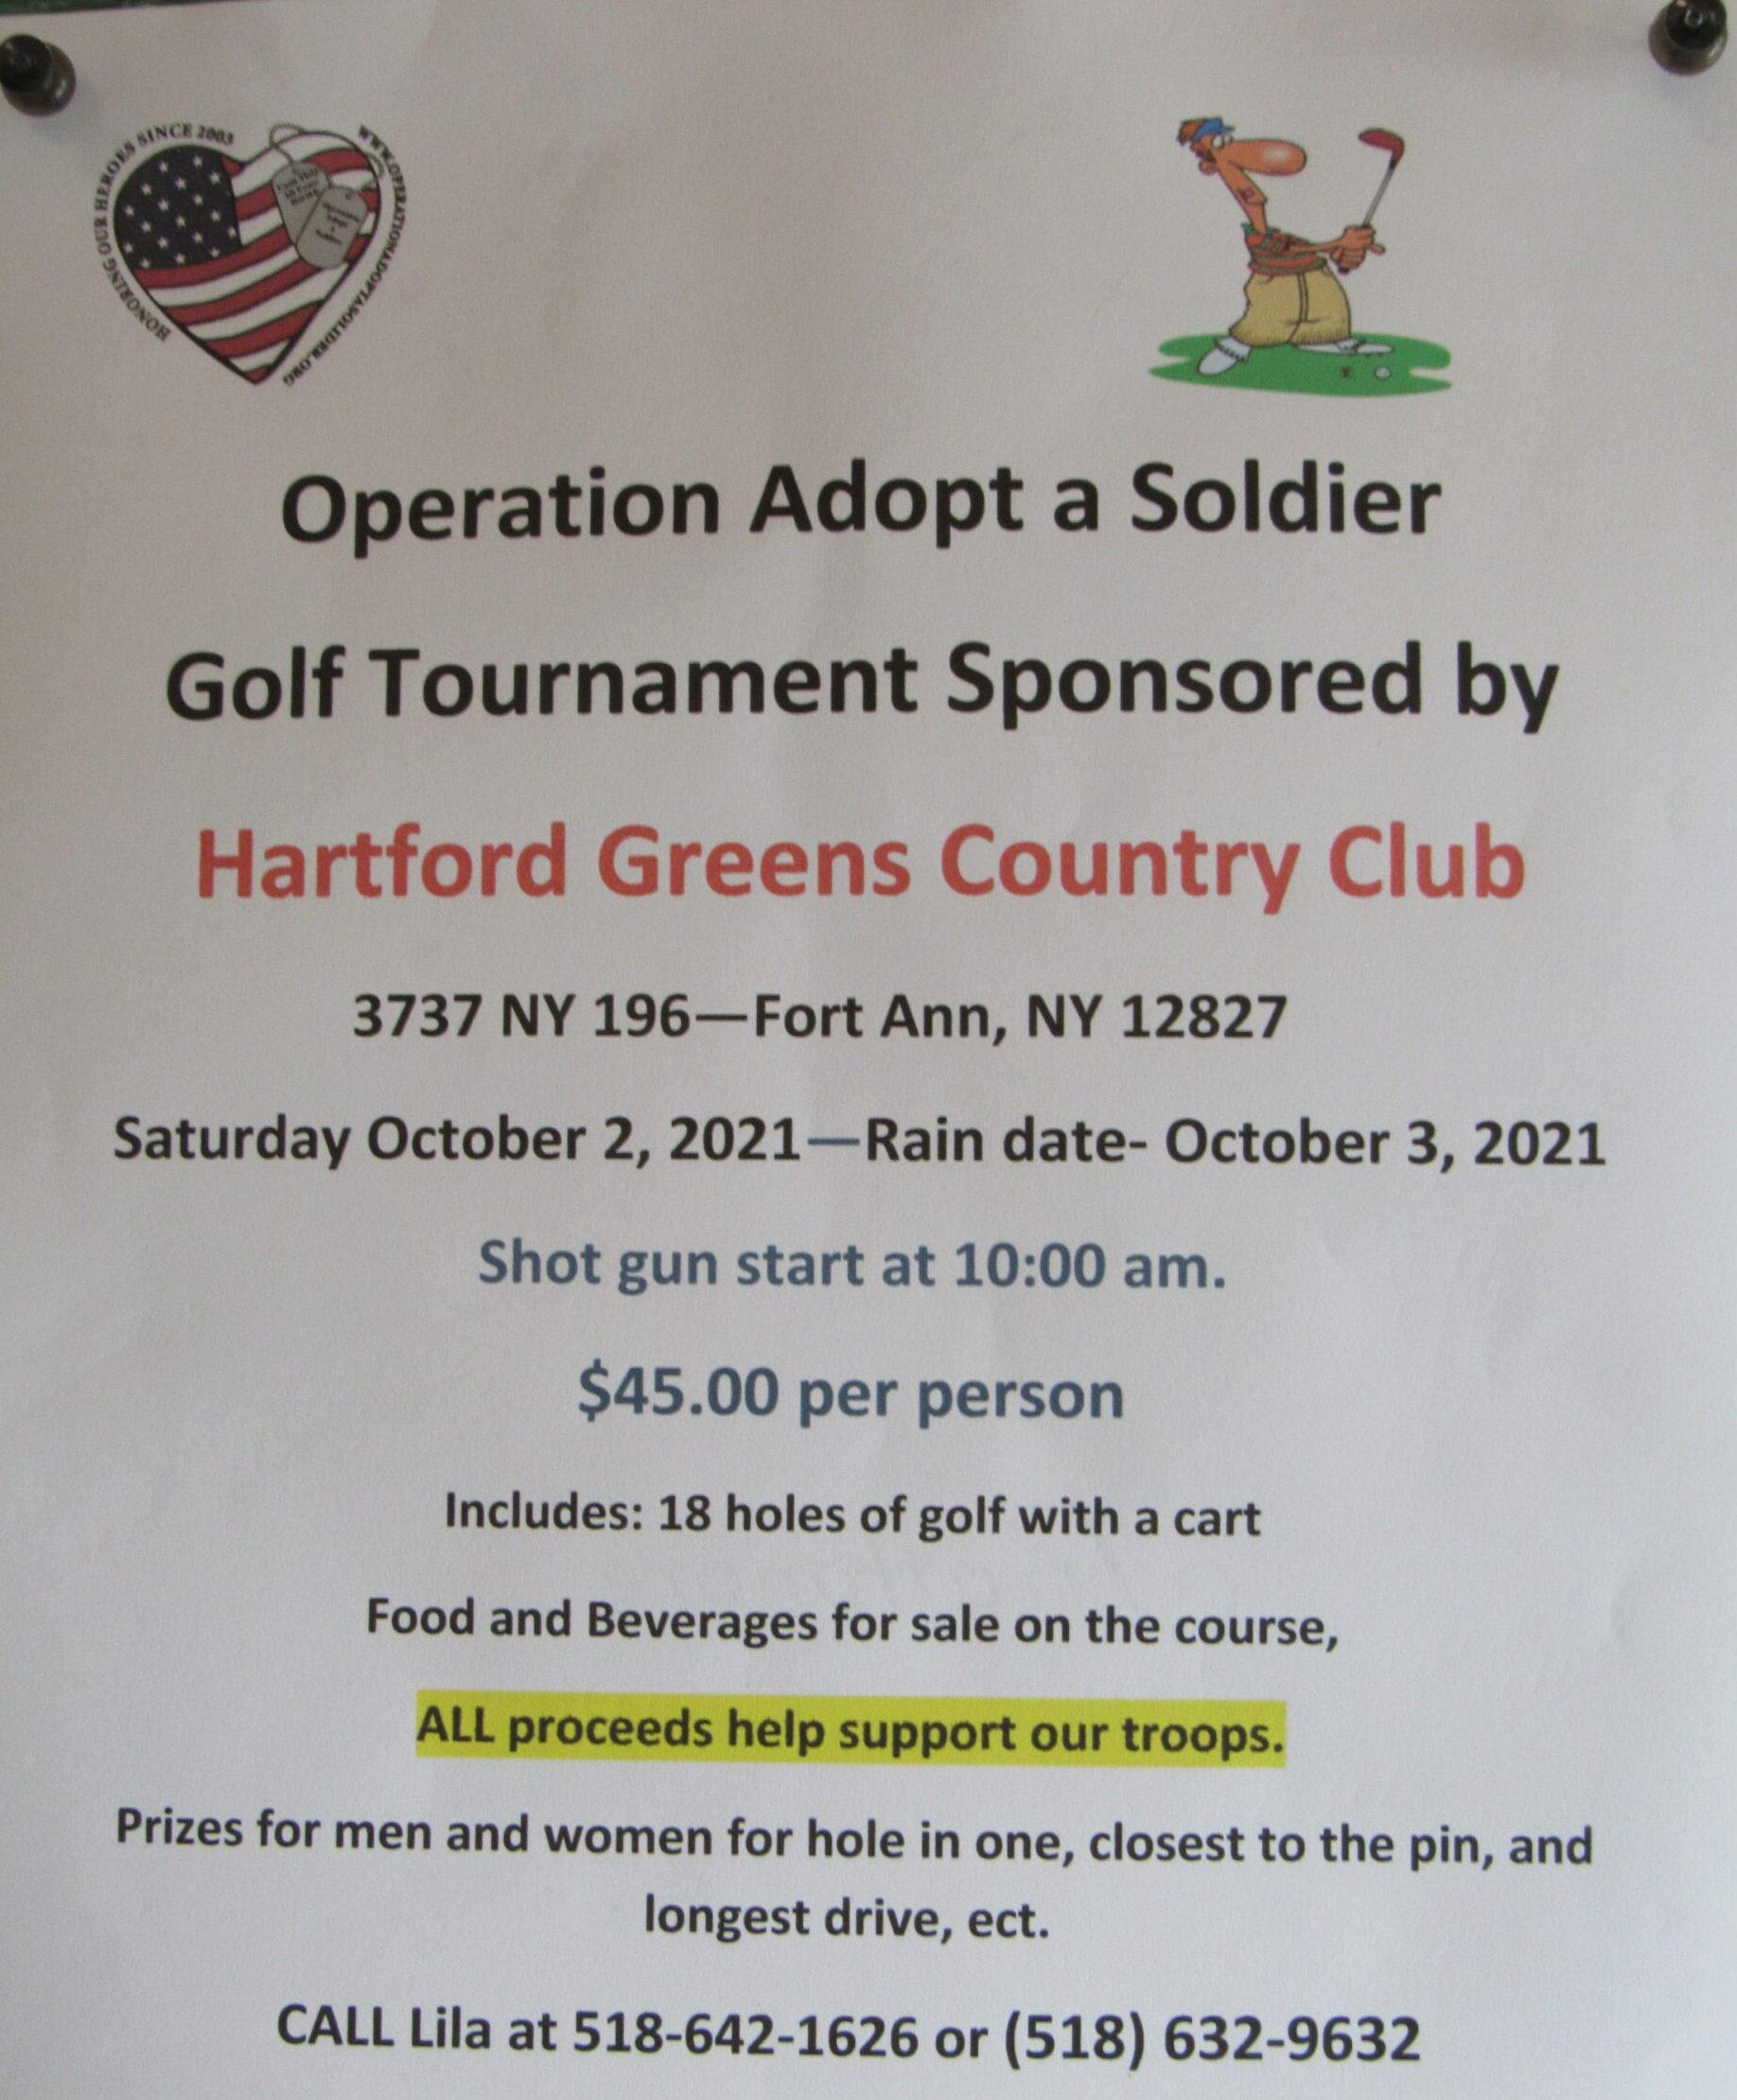 Operation Adopt a Solider Golf Tournament